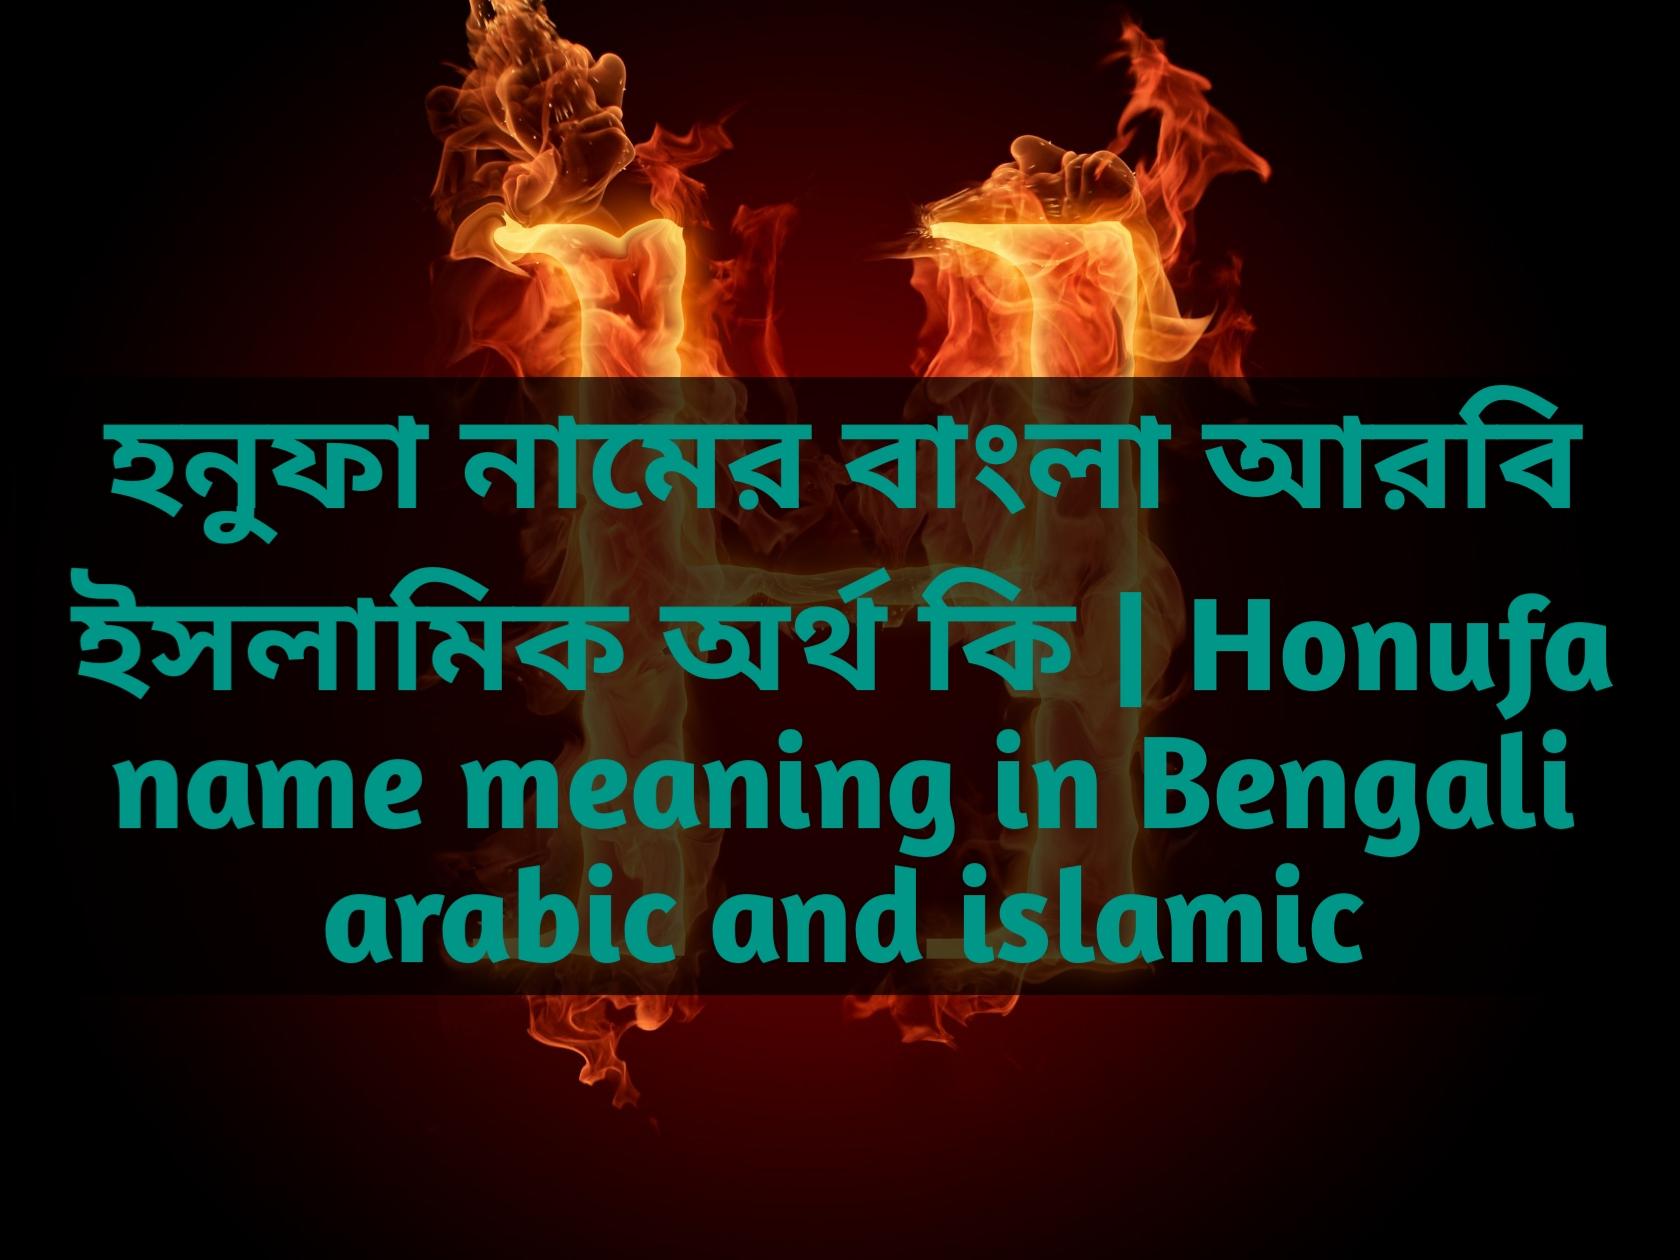 Honufa name meaning in Bengali, হনুফা নামের অর্থ কি, হনুফা নামের বাংলা অর্থ কি, হনুফা নামের ইসলামিক অর্থ কি,